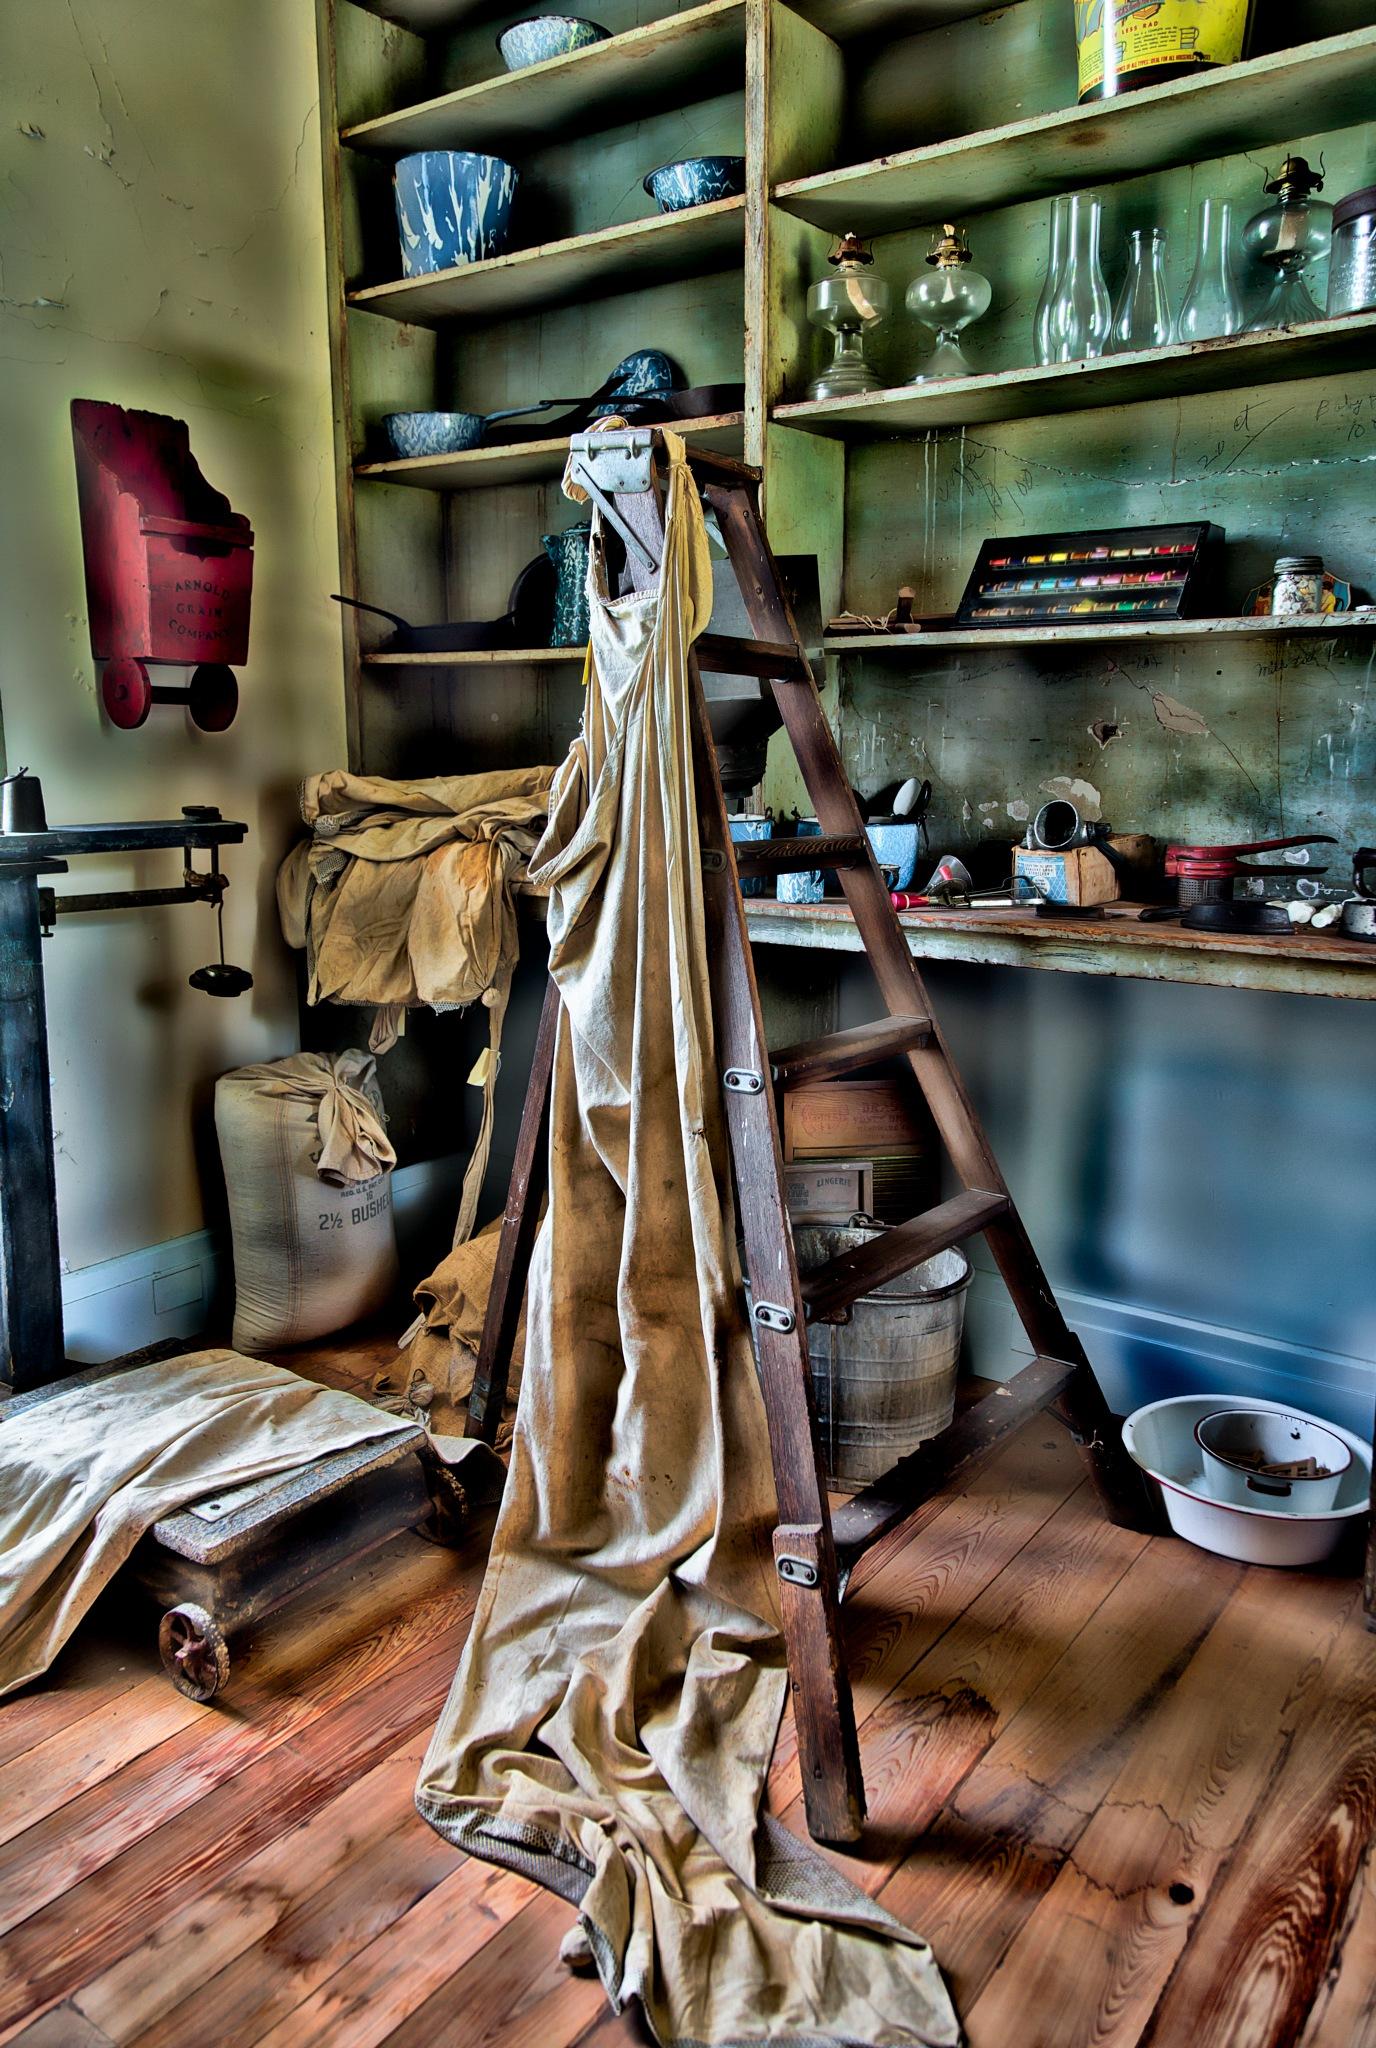 Storeroom by dorothy.pierinirodgers